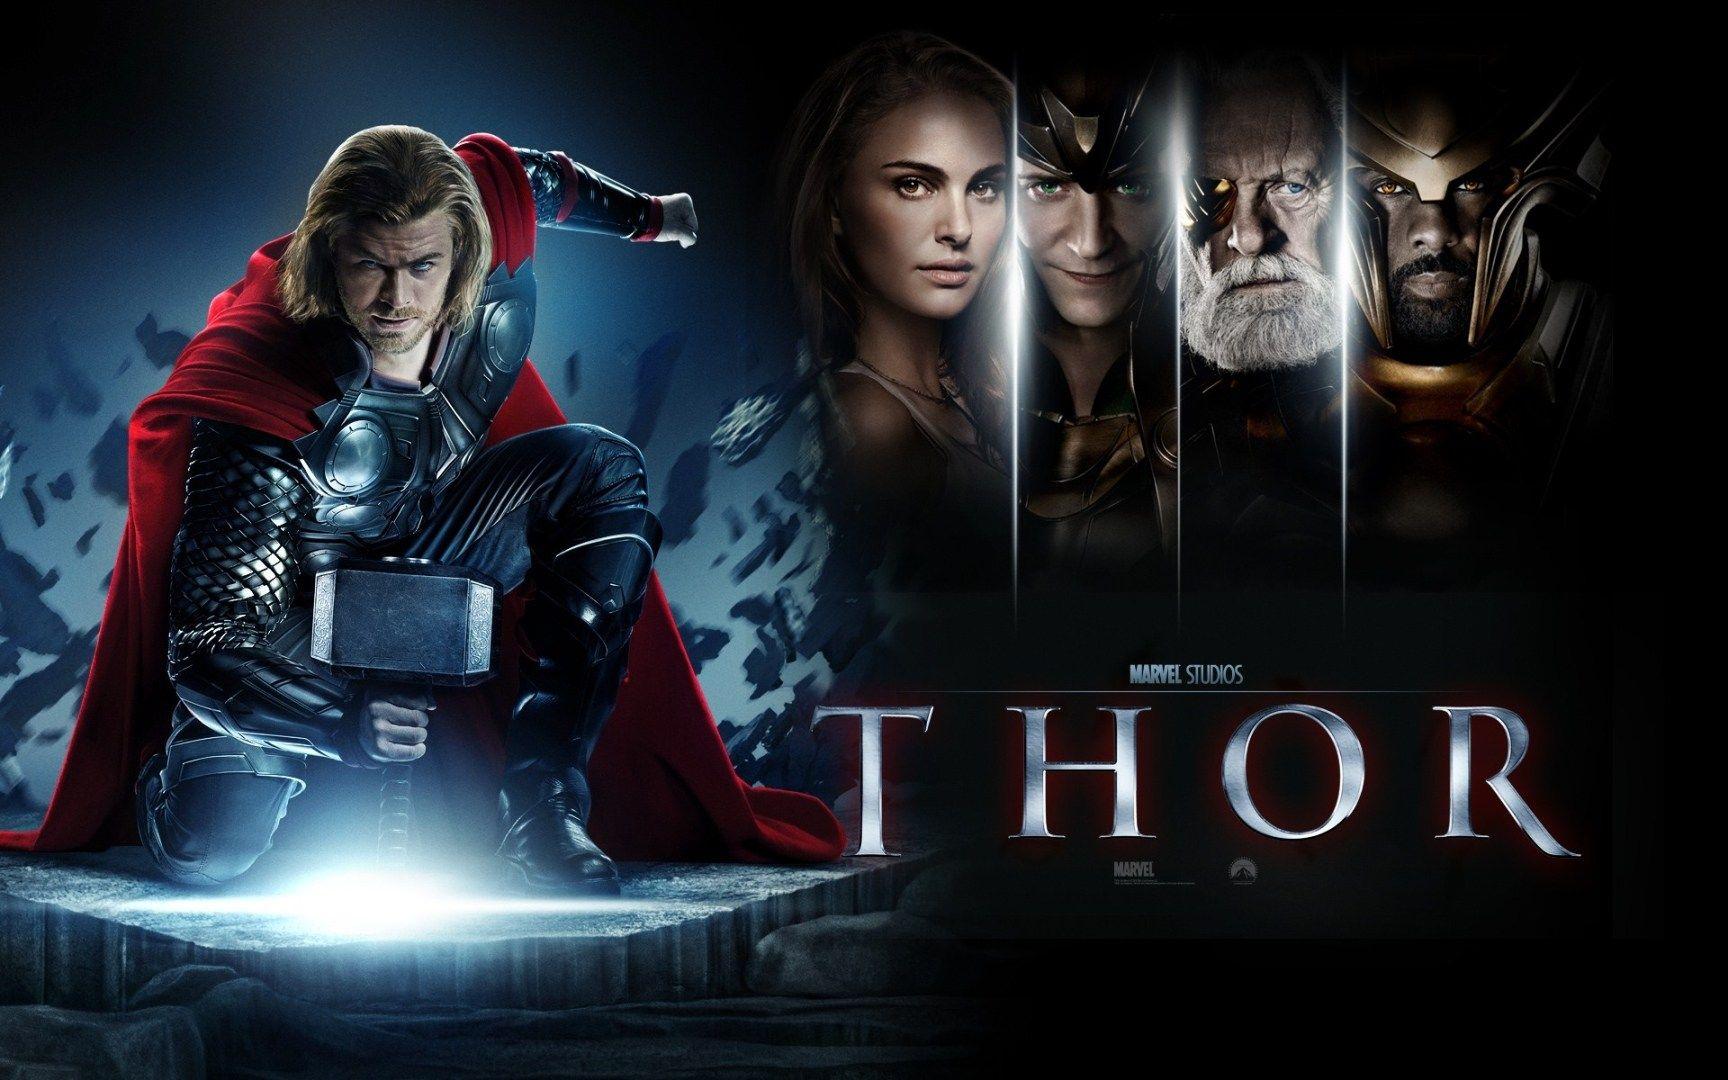 Thor Marvel Movie Wallpaper Chris Hemsworth Anthony Hopkins Hemsworth